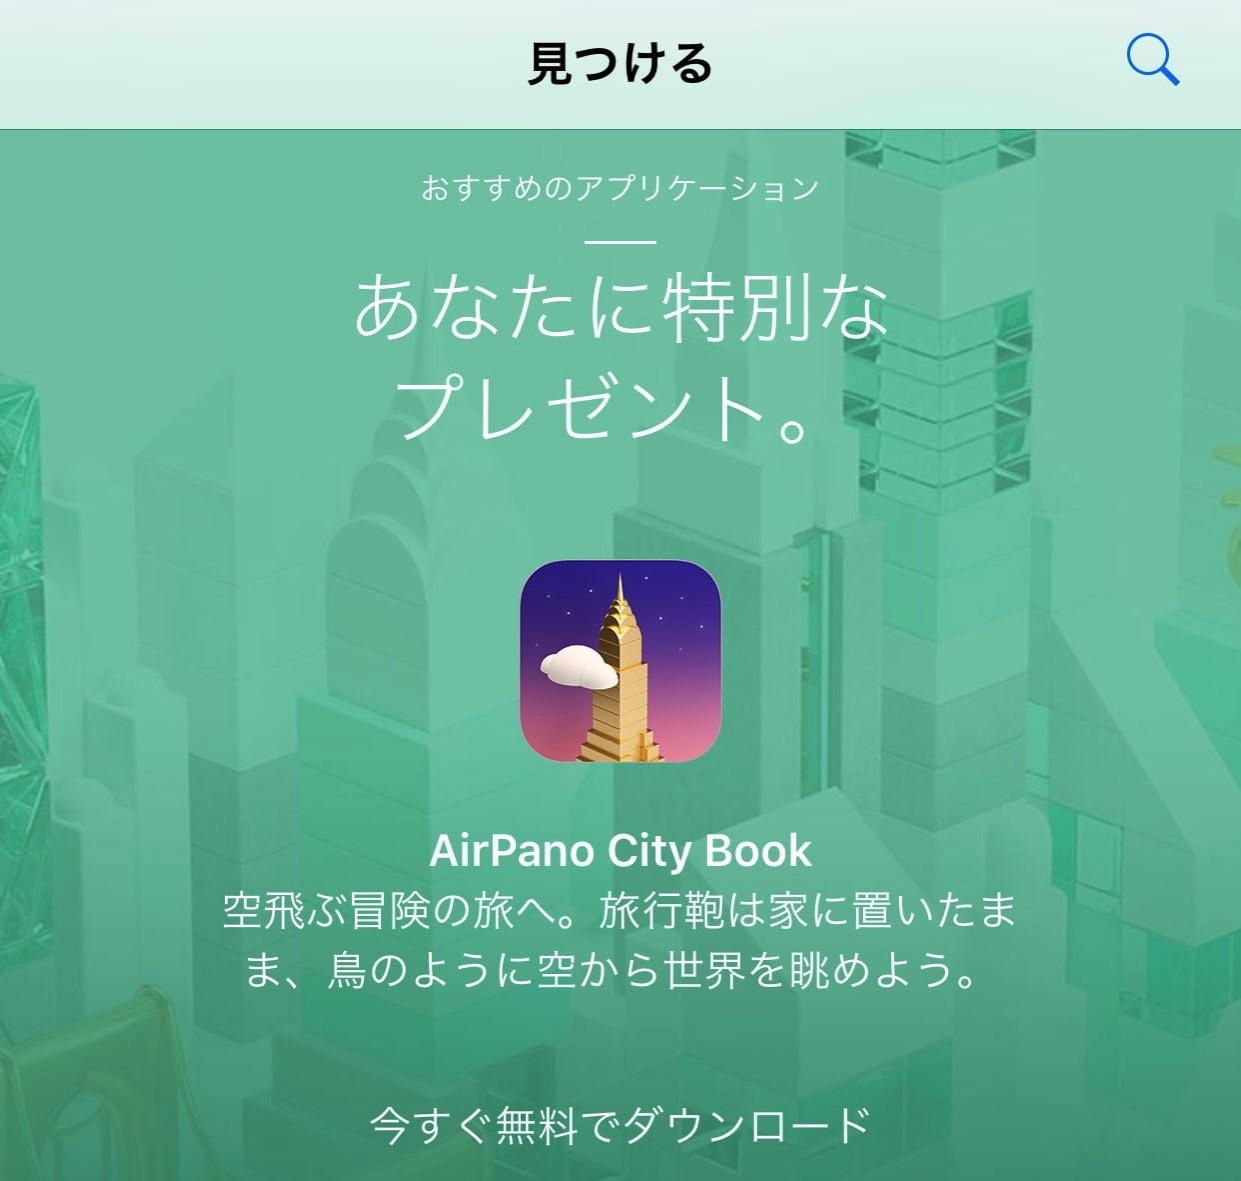 AirPanoCityBook FreeDownload 01